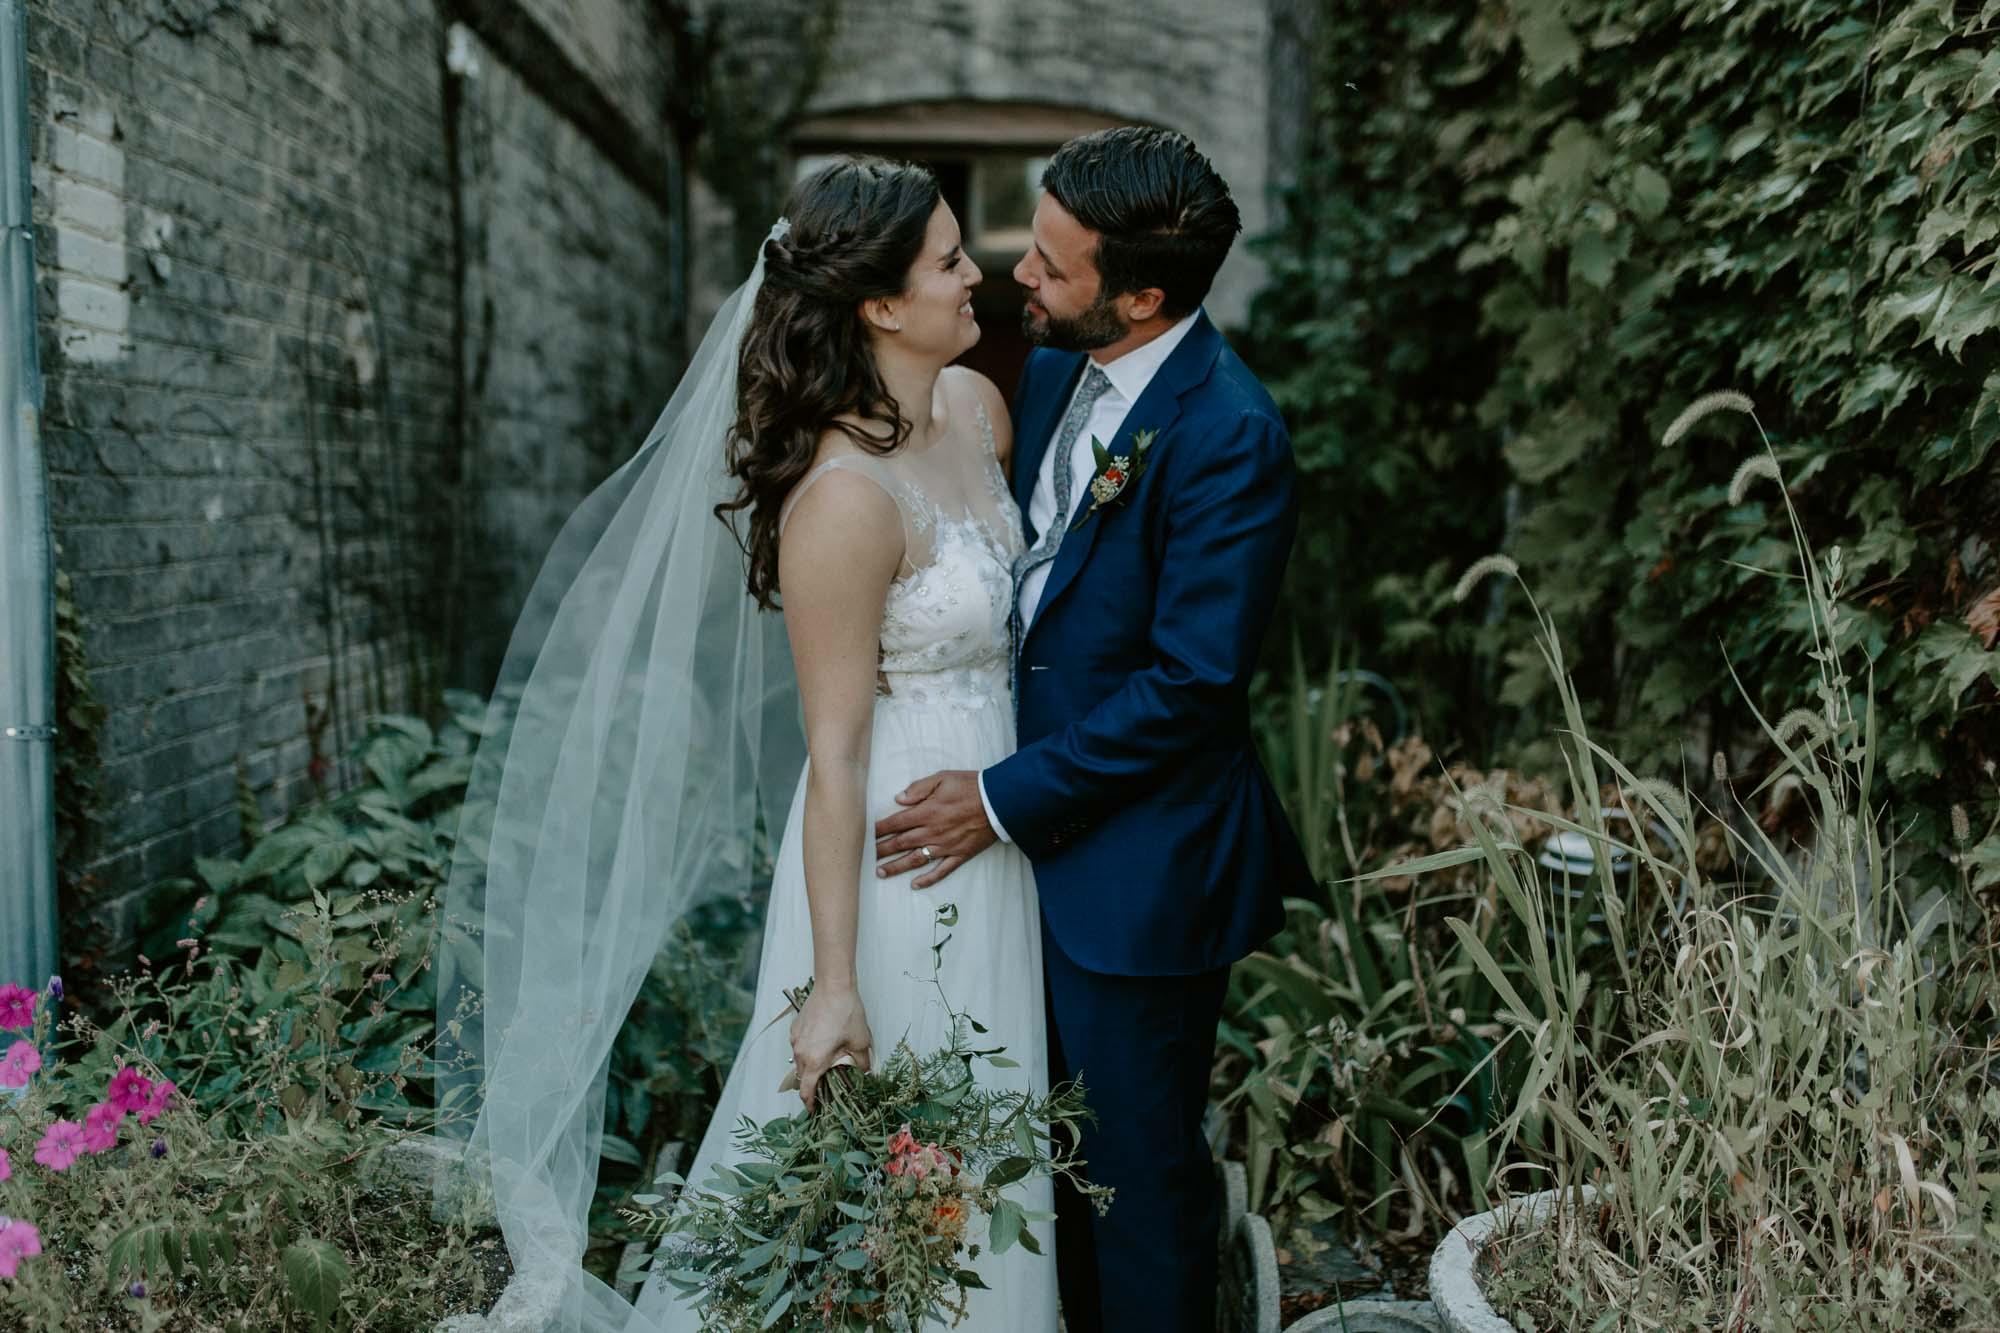 journeyman_distillery_wedding_photographer_chicago_il_wright_photographs-4060.jpg